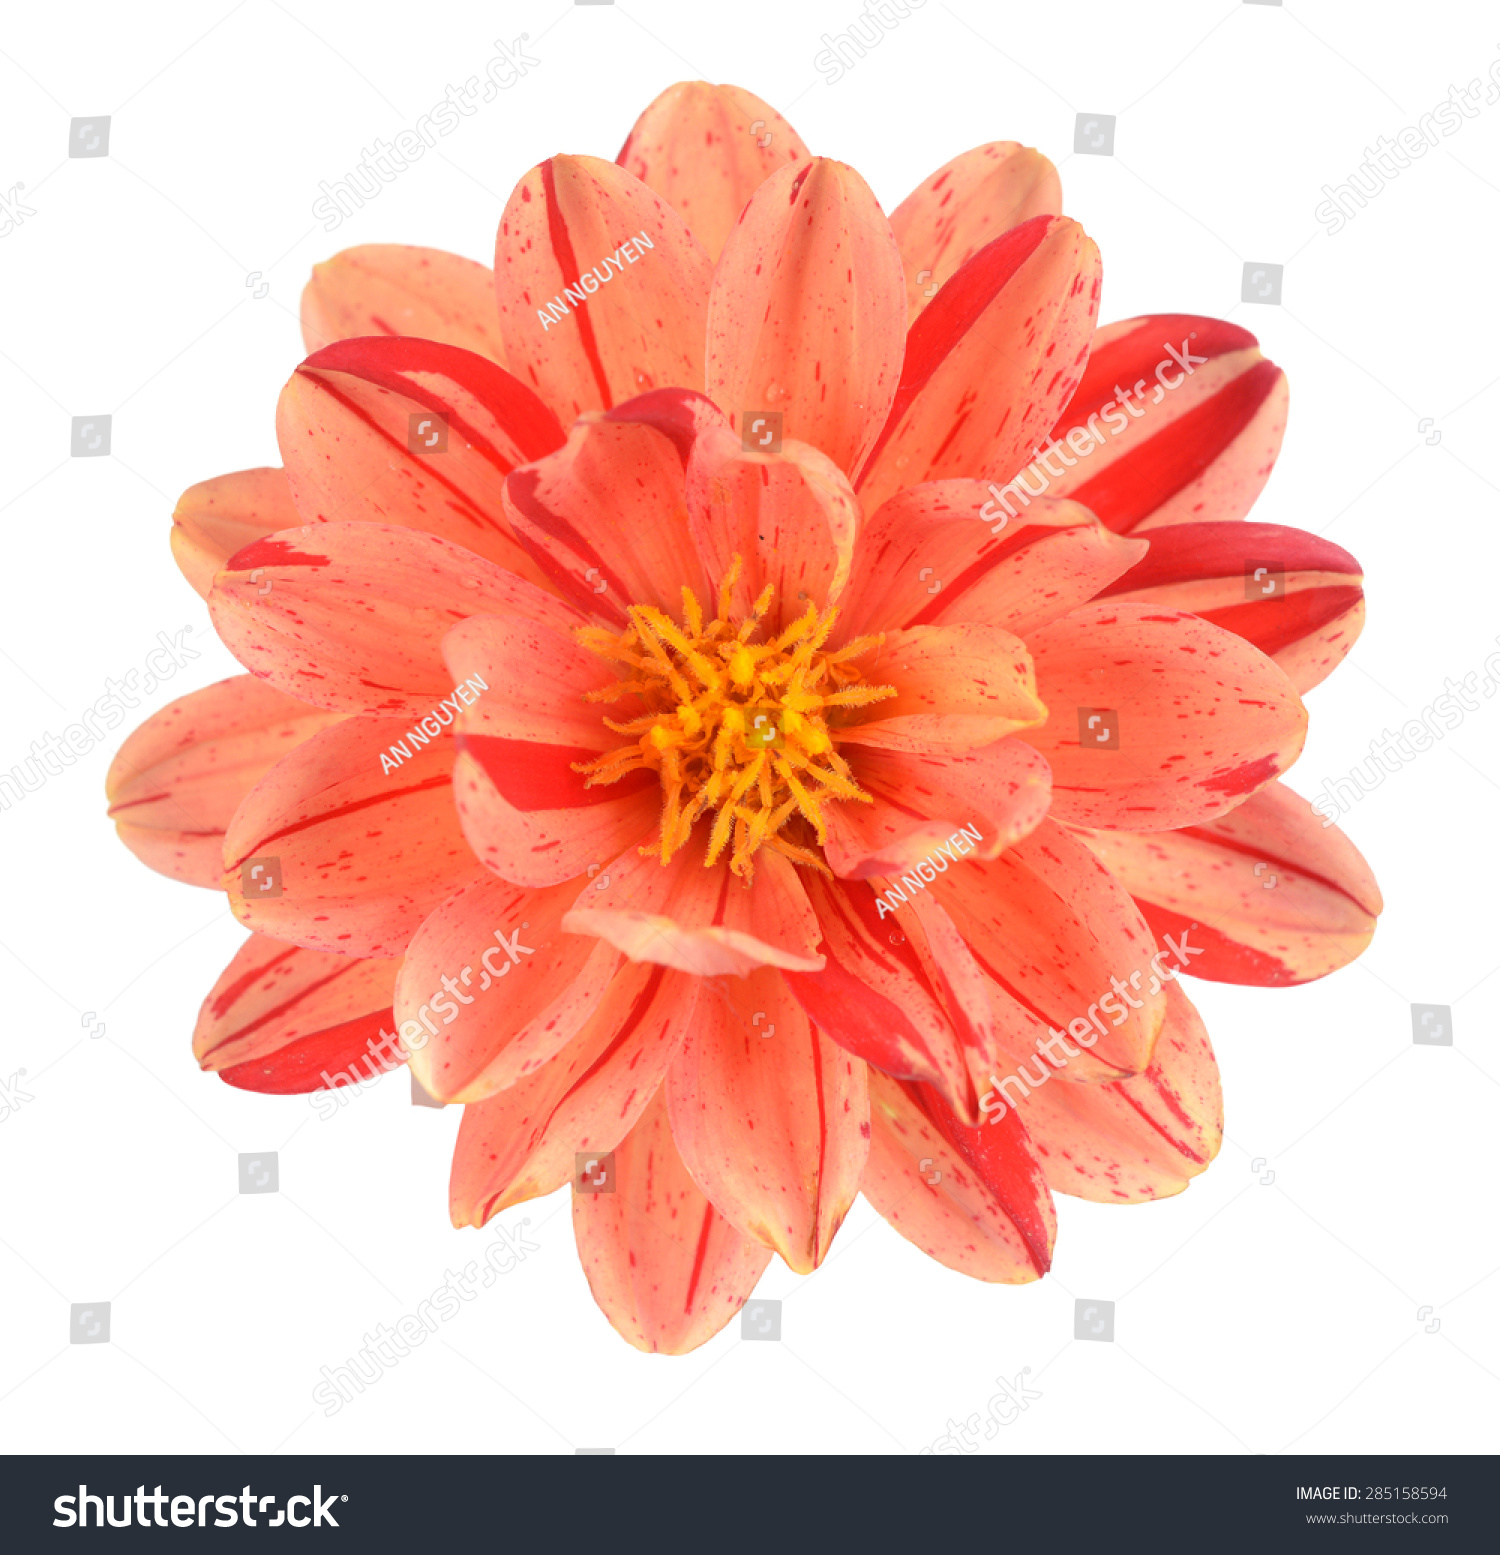 Two Tone Red Orange Dahlia Flower Stock Photo Edit Now 285158594